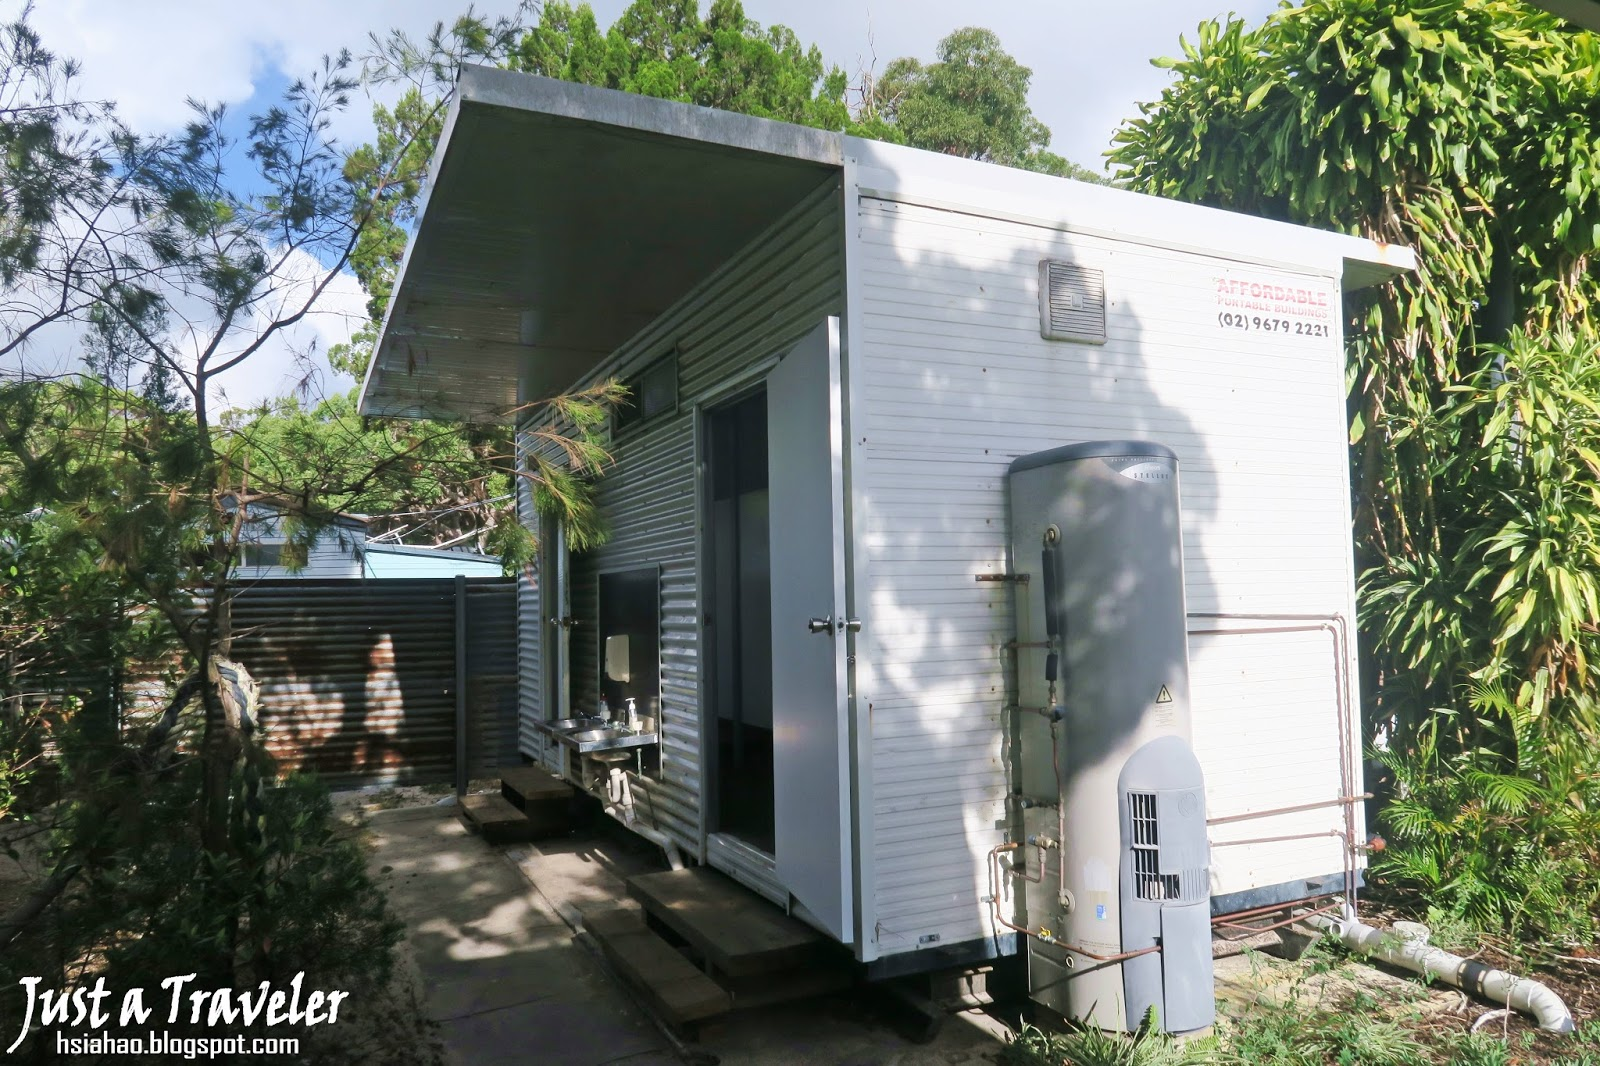 布里斯本-摩頓島-住宿-推薦-旅遊-自由行-澳洲-Brisbane-Moreton-Island-Tourist-Attraction-Travel-Australia